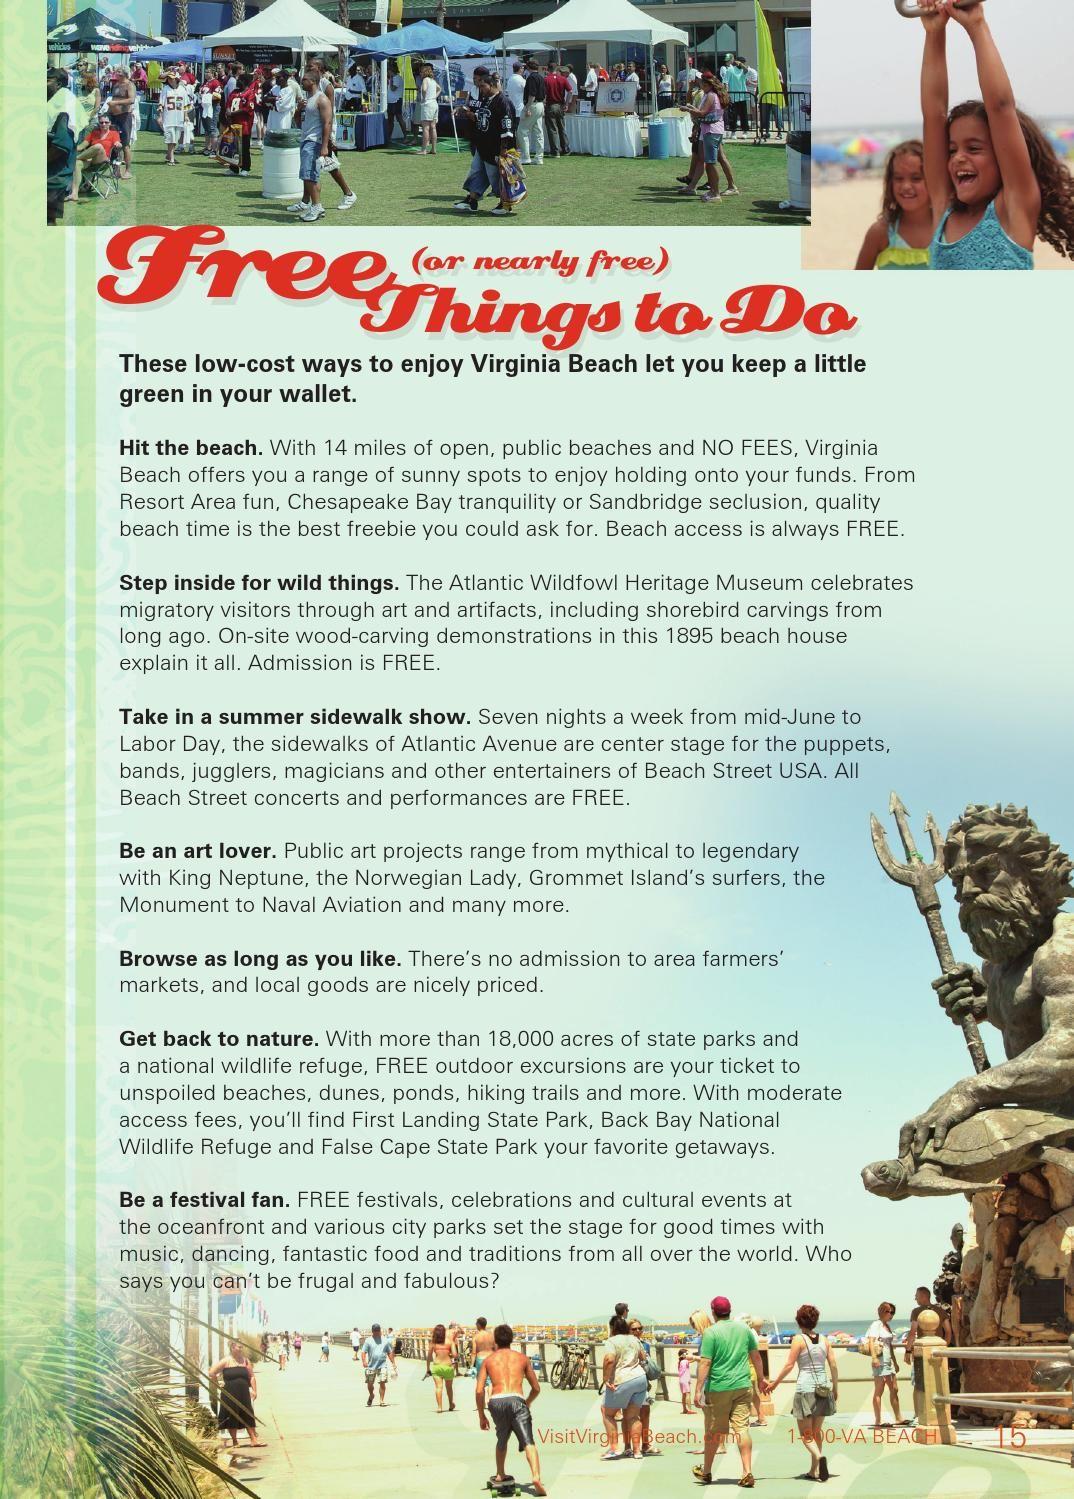 2014 Virginia Beach Vacation Guide